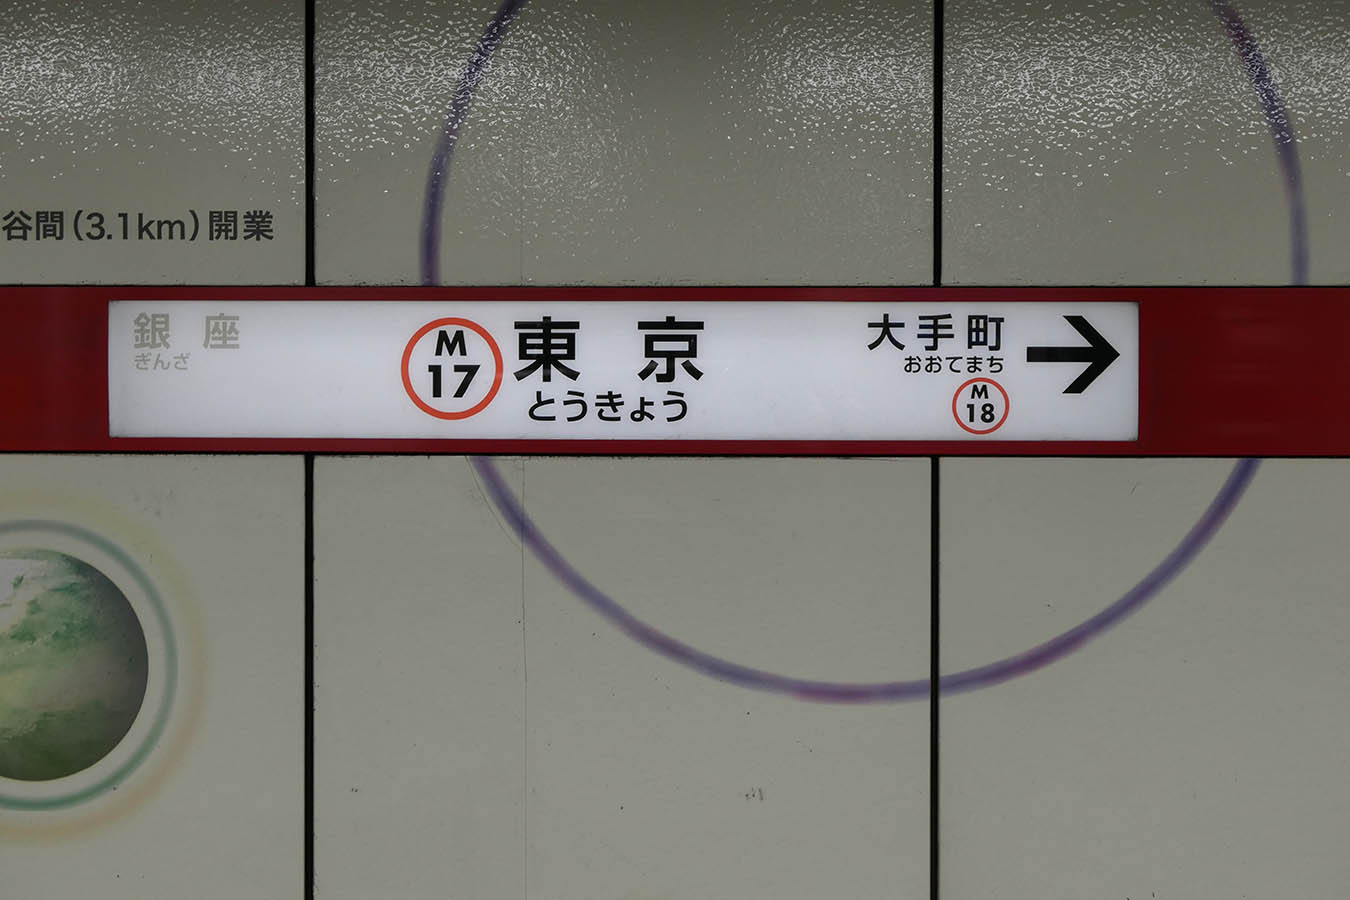 M17_photo05.jpg